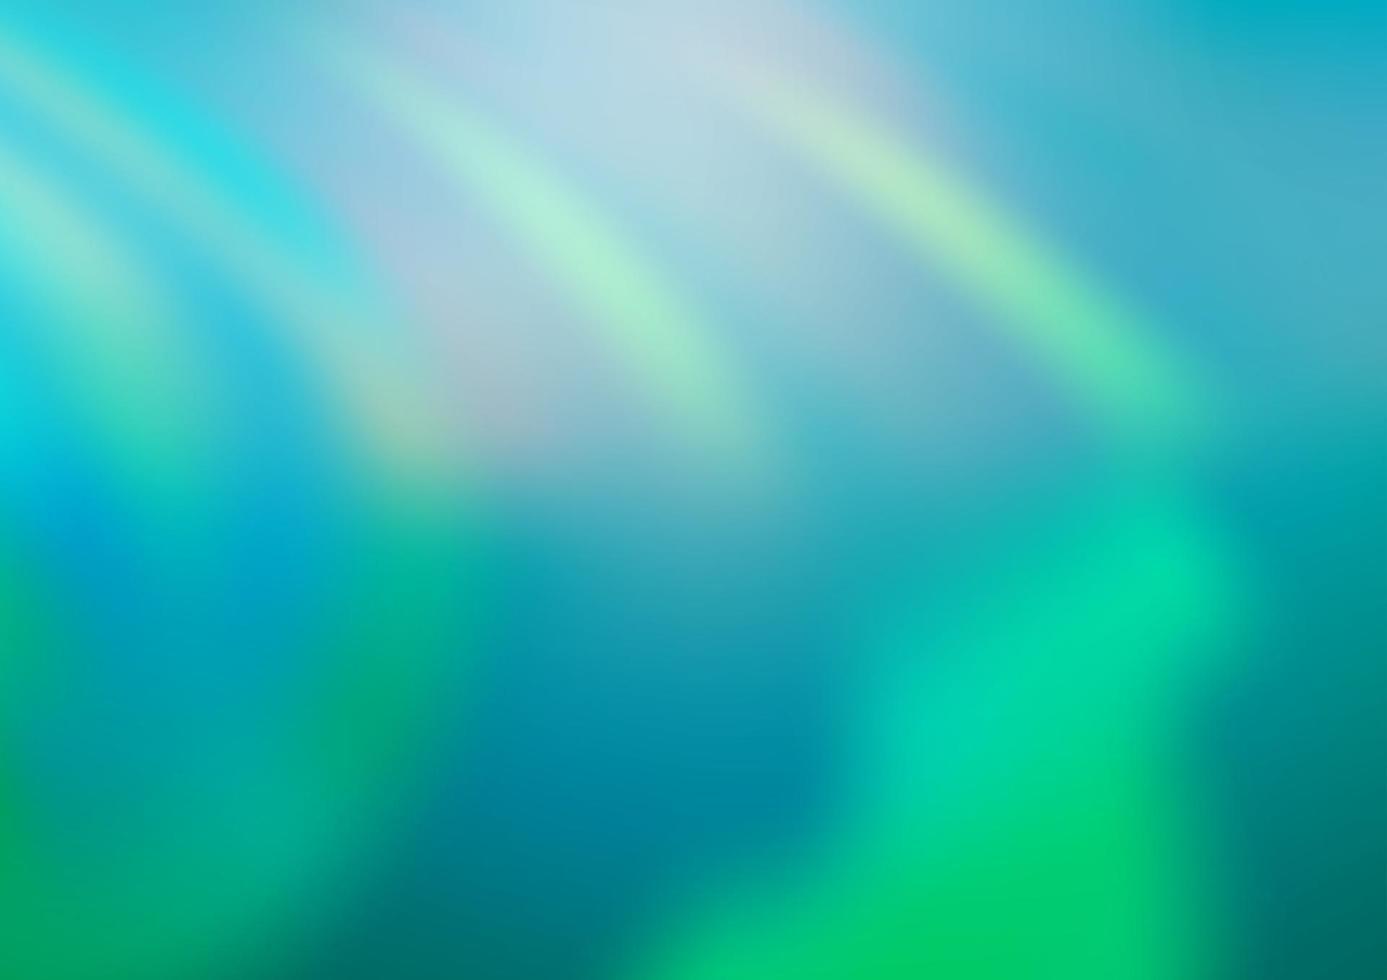 luz azul, verde vetor turva modelo brilhante.